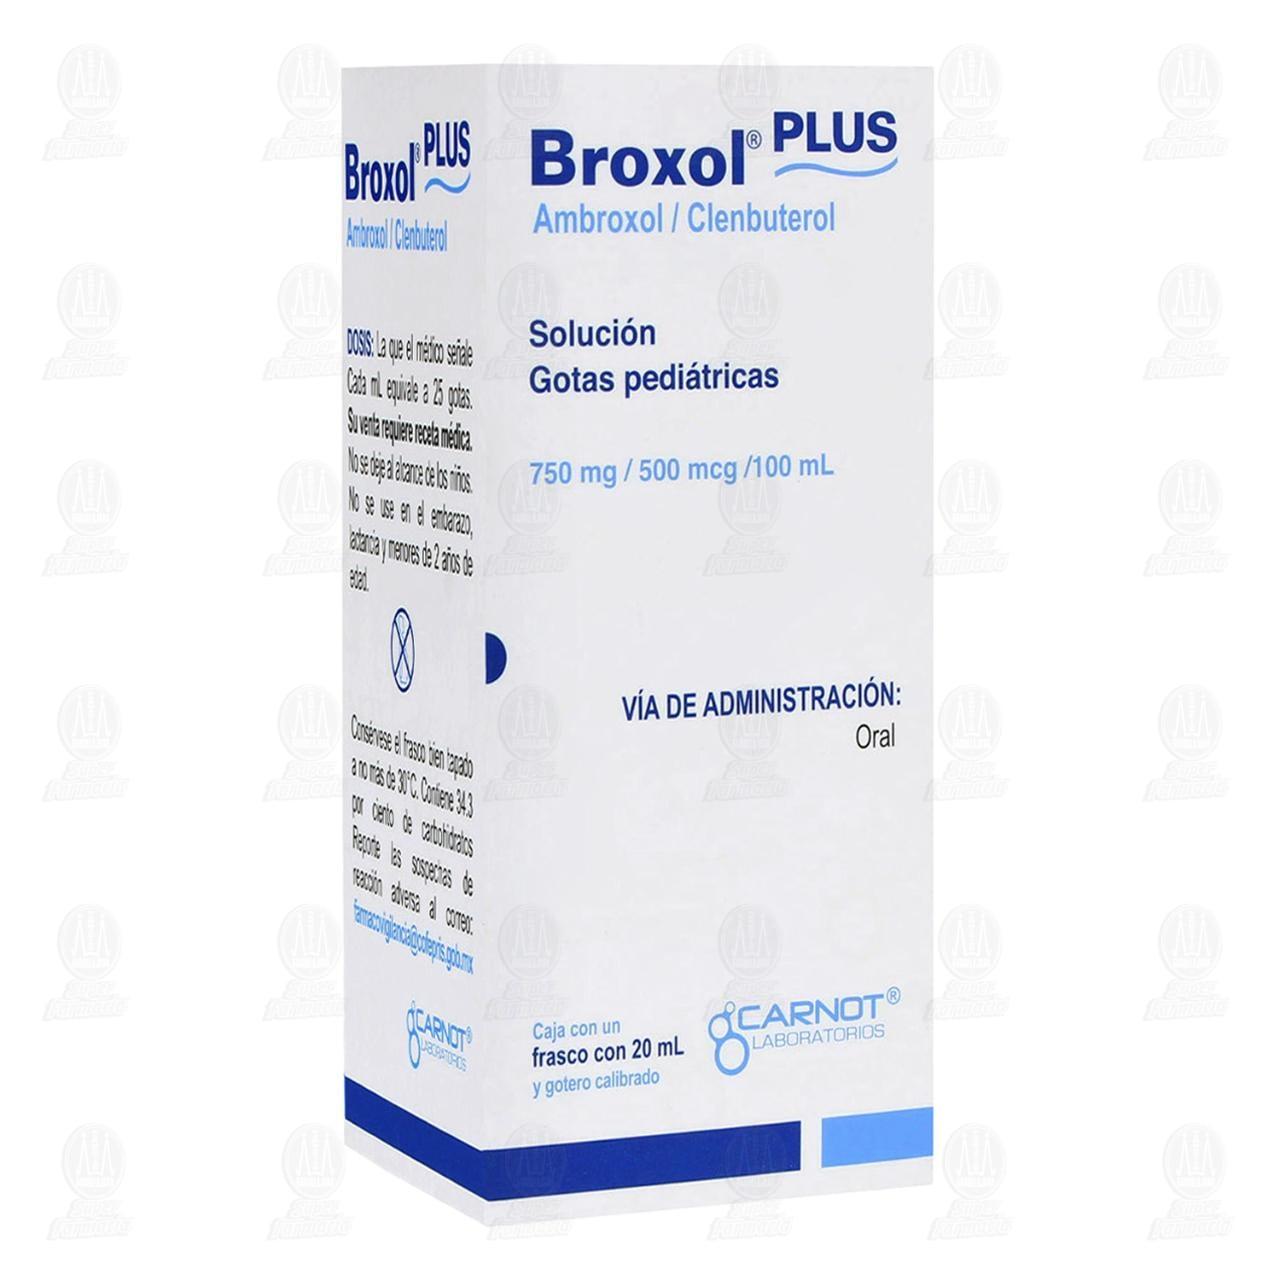 Comprar Broxol Plus Gotas Pediátricas 750mg/500mcg/100ml 20ml en Farmacias Guadalajara